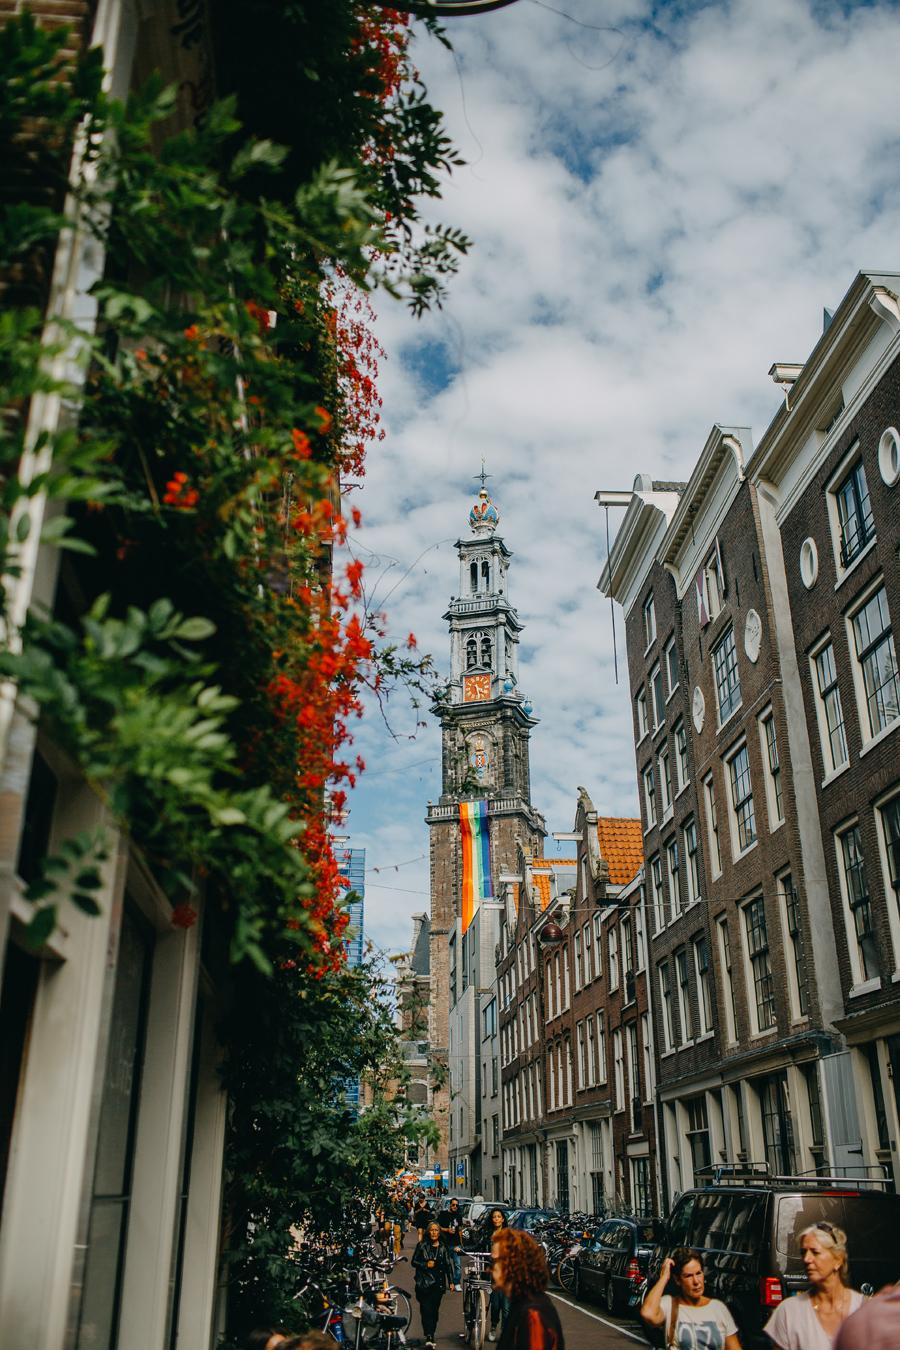 023-amsterdam-bikes-travel-photography.jpg